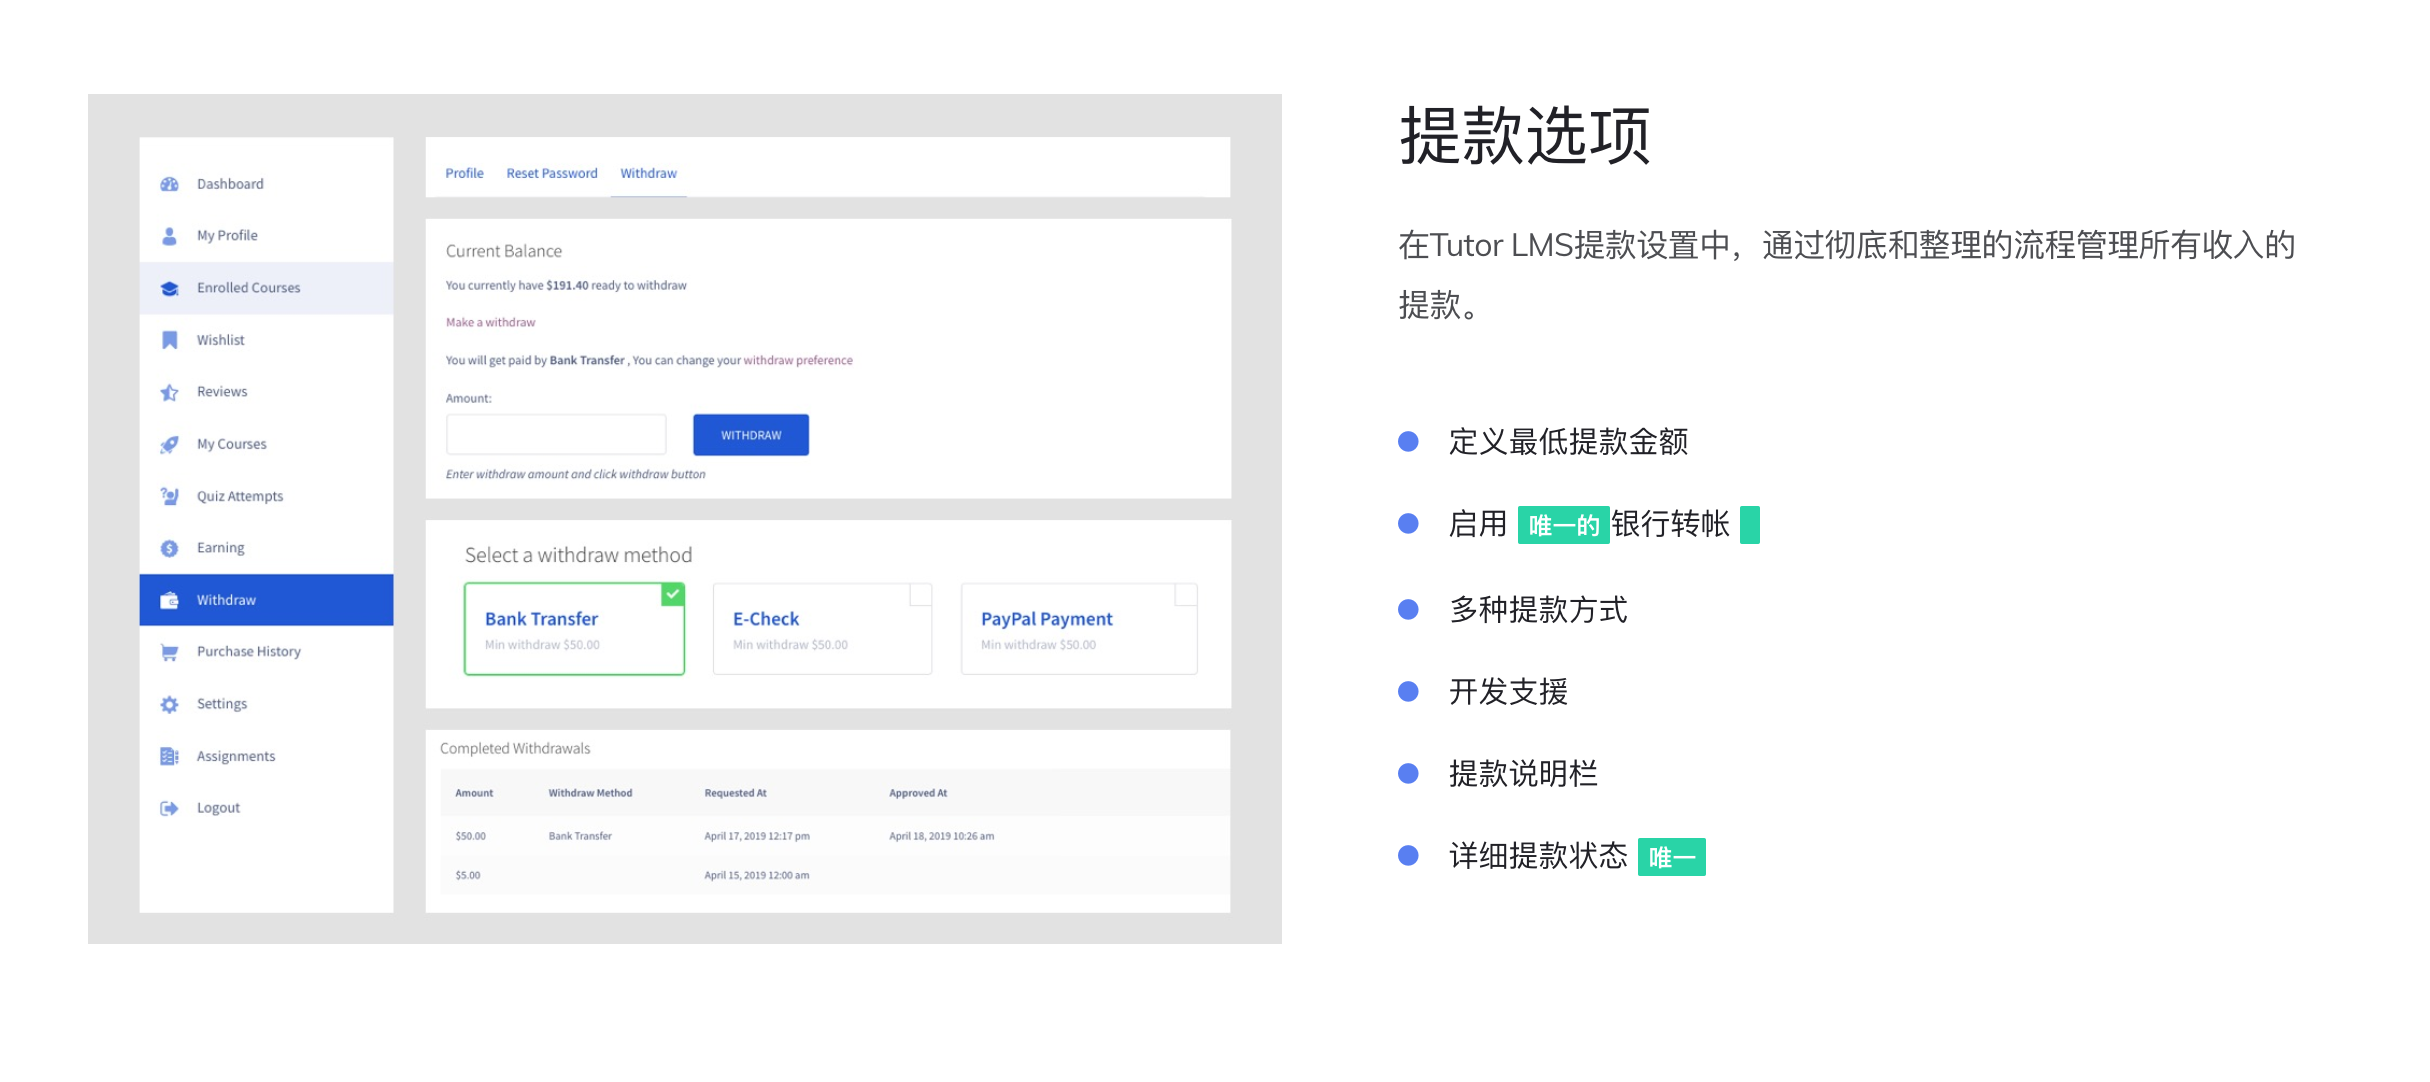 Tutor LMS Pro WordPress Plugin 智能、简单、可扩展在线学习系统插件